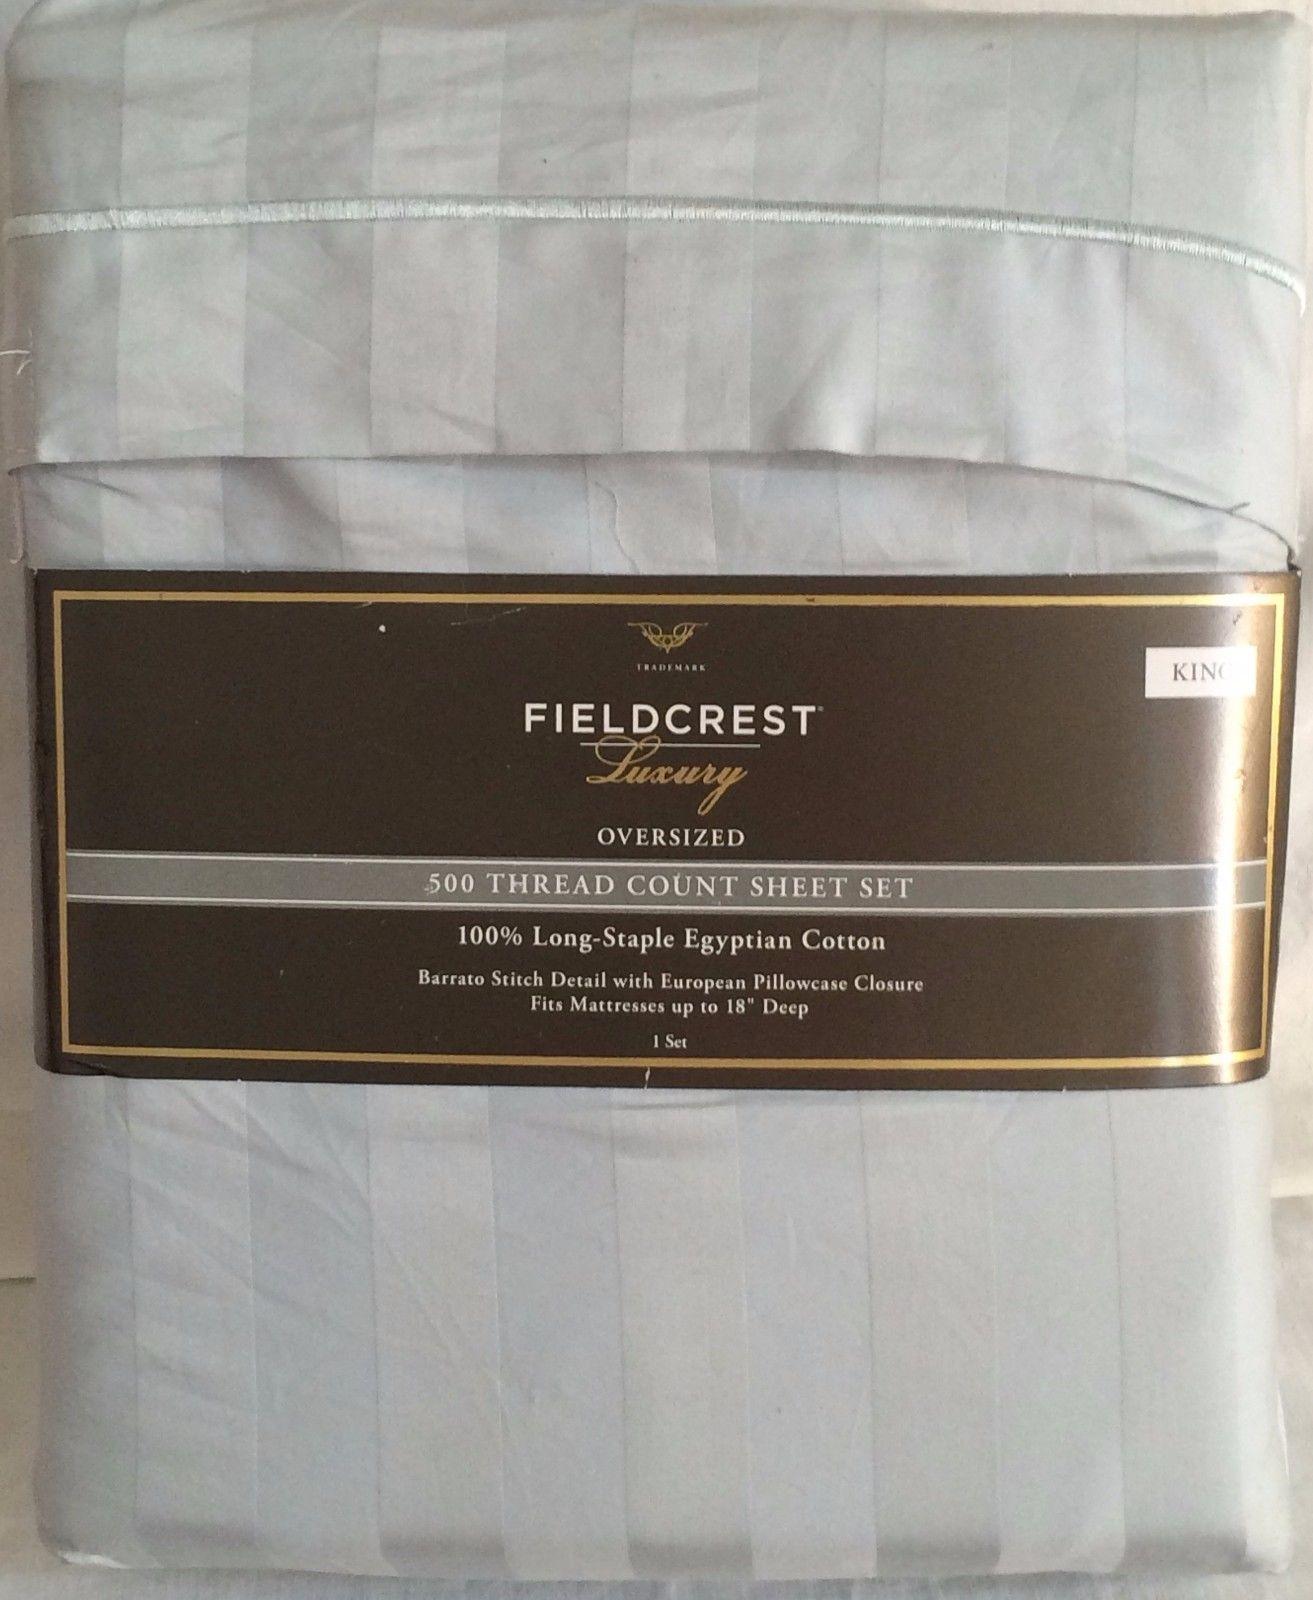 Organic Bamboo Sheets Target | Fieldcrest Cannon Sheets | Fieldcrest Luxury Sheets